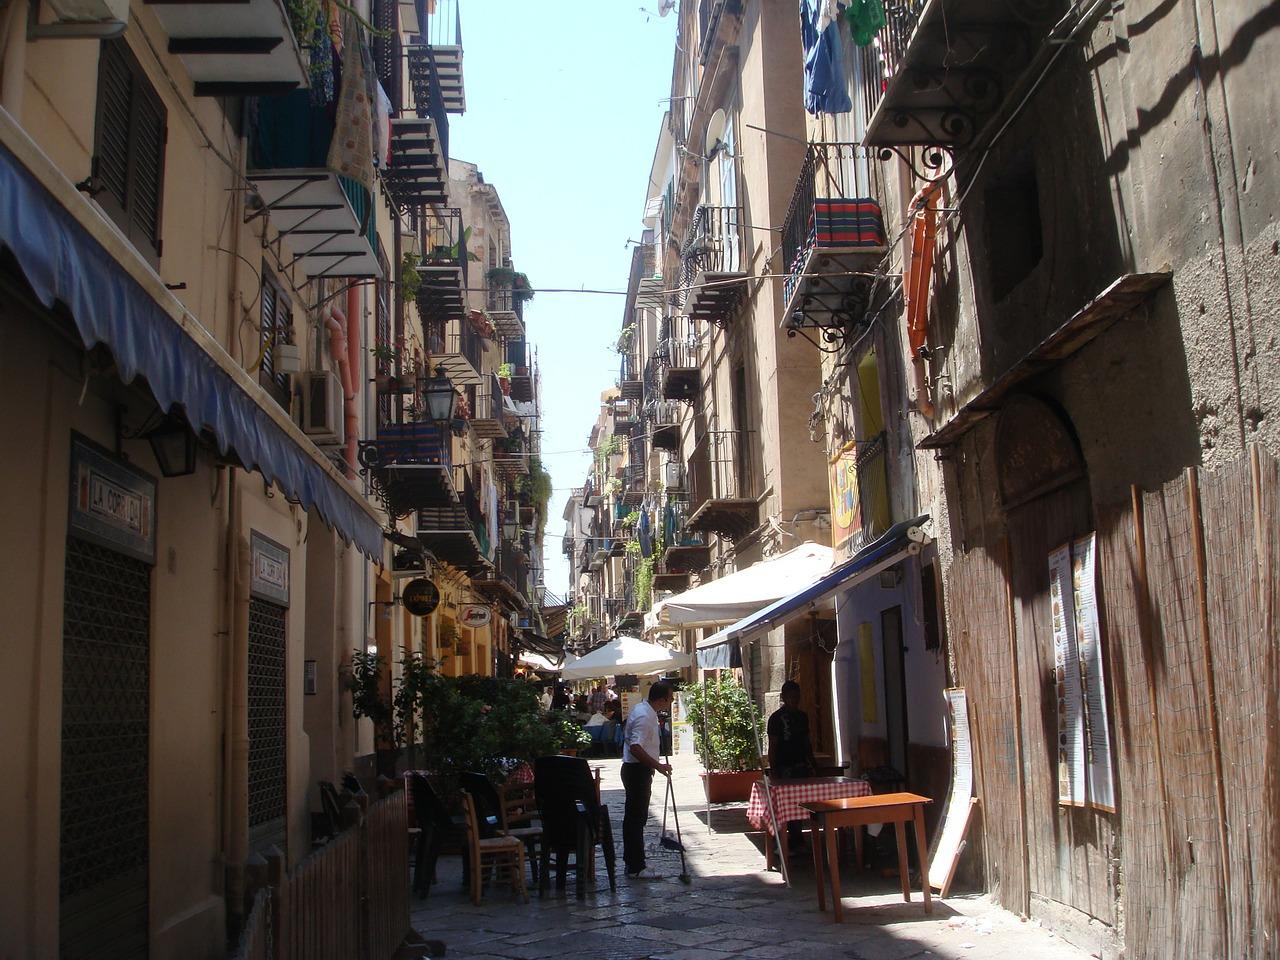 urokliwe uliczki Palermo